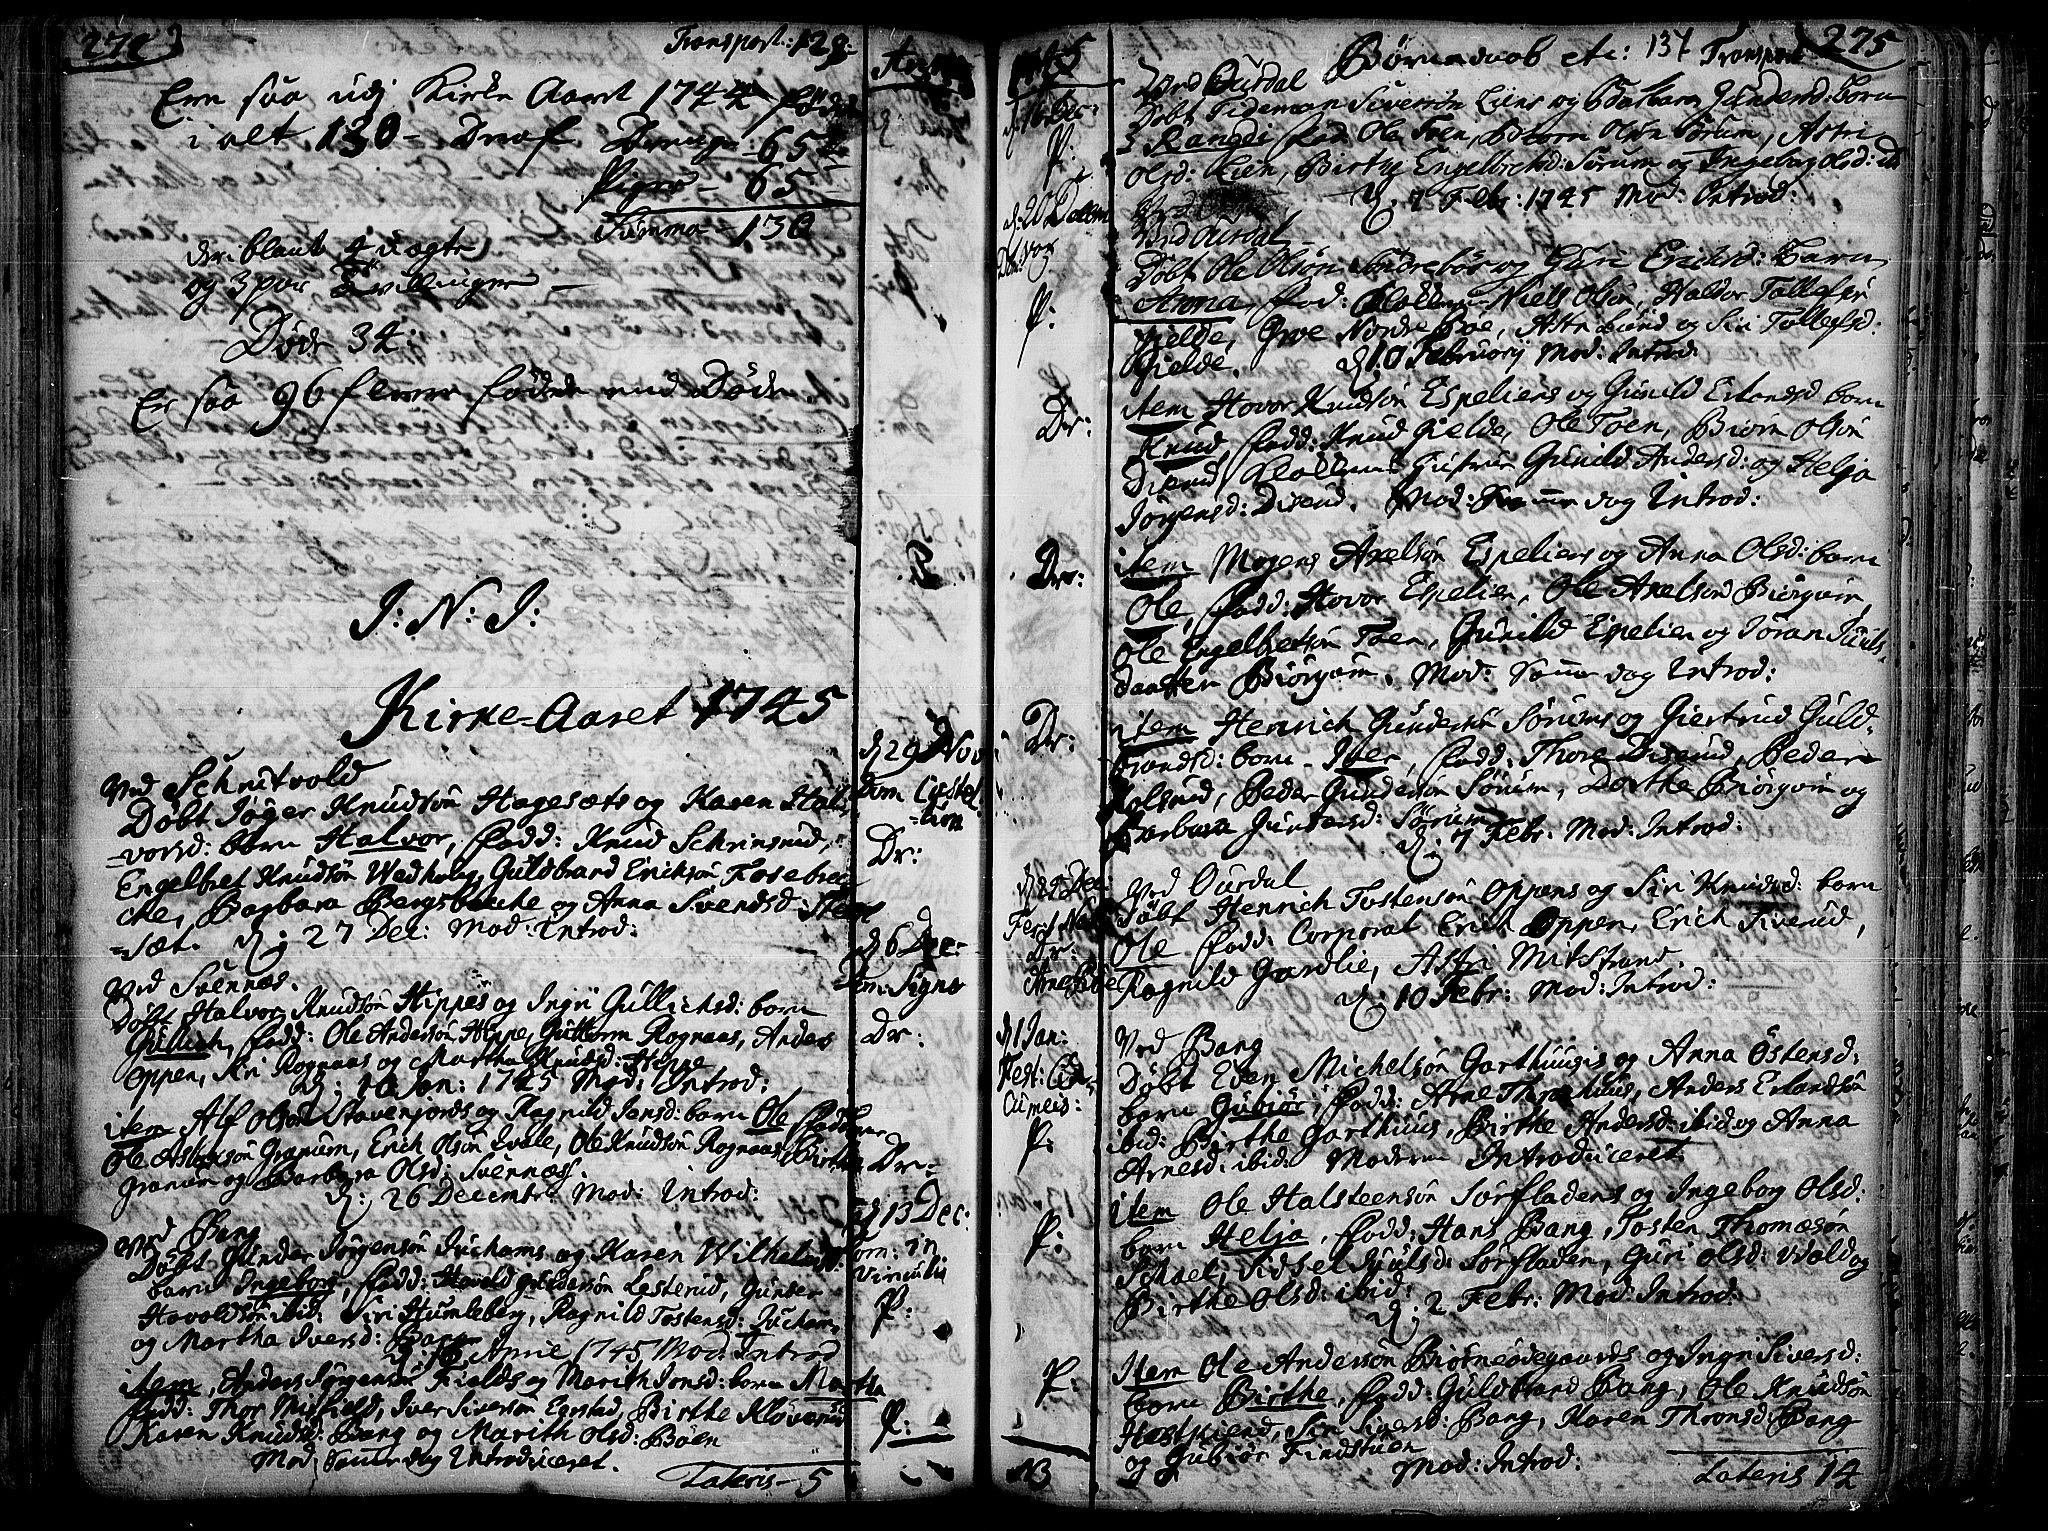 SAH, Aurdal prestekontor, Ministerialbok nr. 4, 1730-1762, s. 274-275